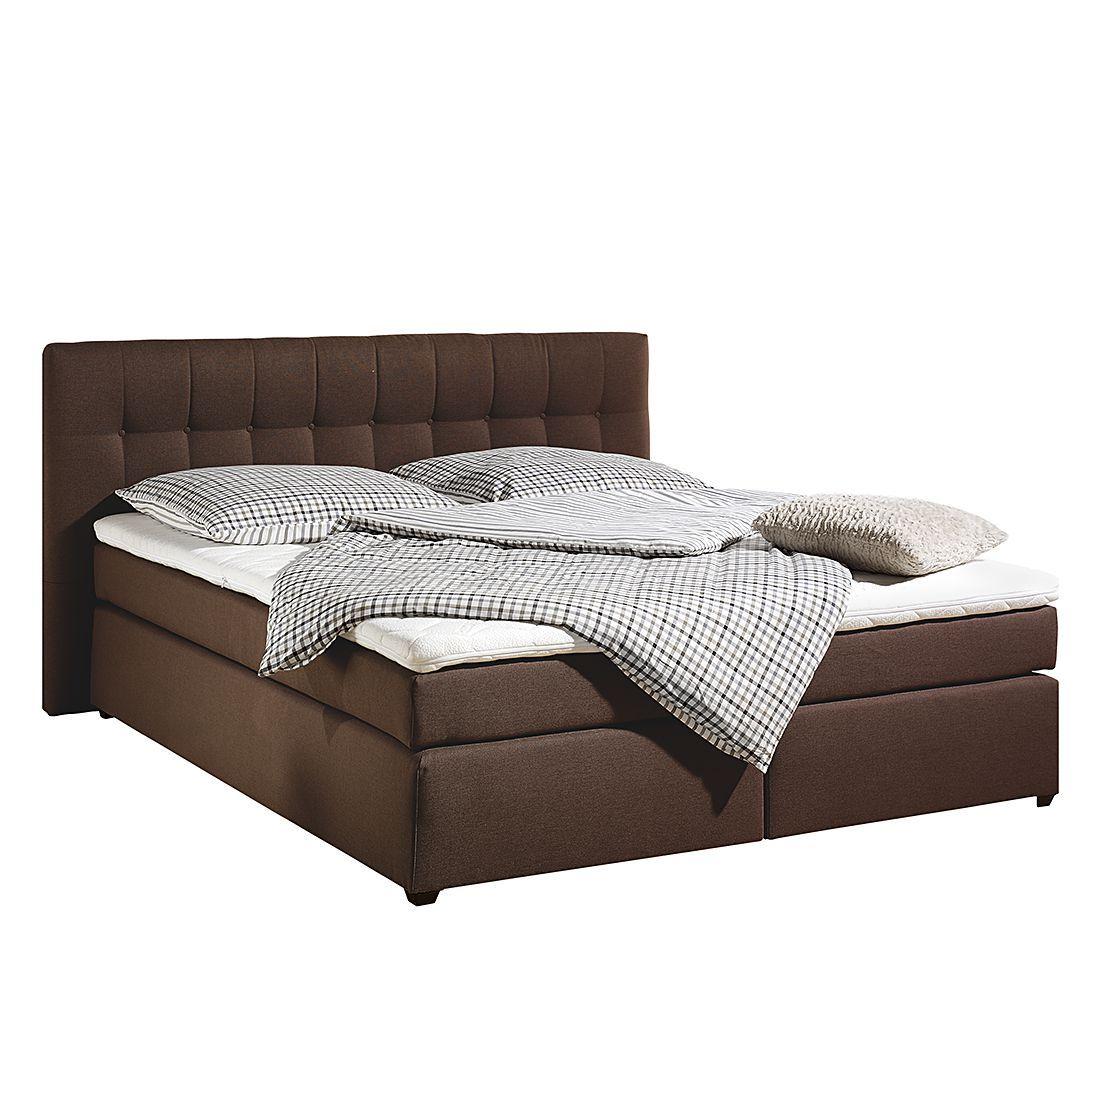 boxspringbett jean inklusive topper strukturstoff 160 x 200cm h3 ab 80 kg. Black Bedroom Furniture Sets. Home Design Ideas